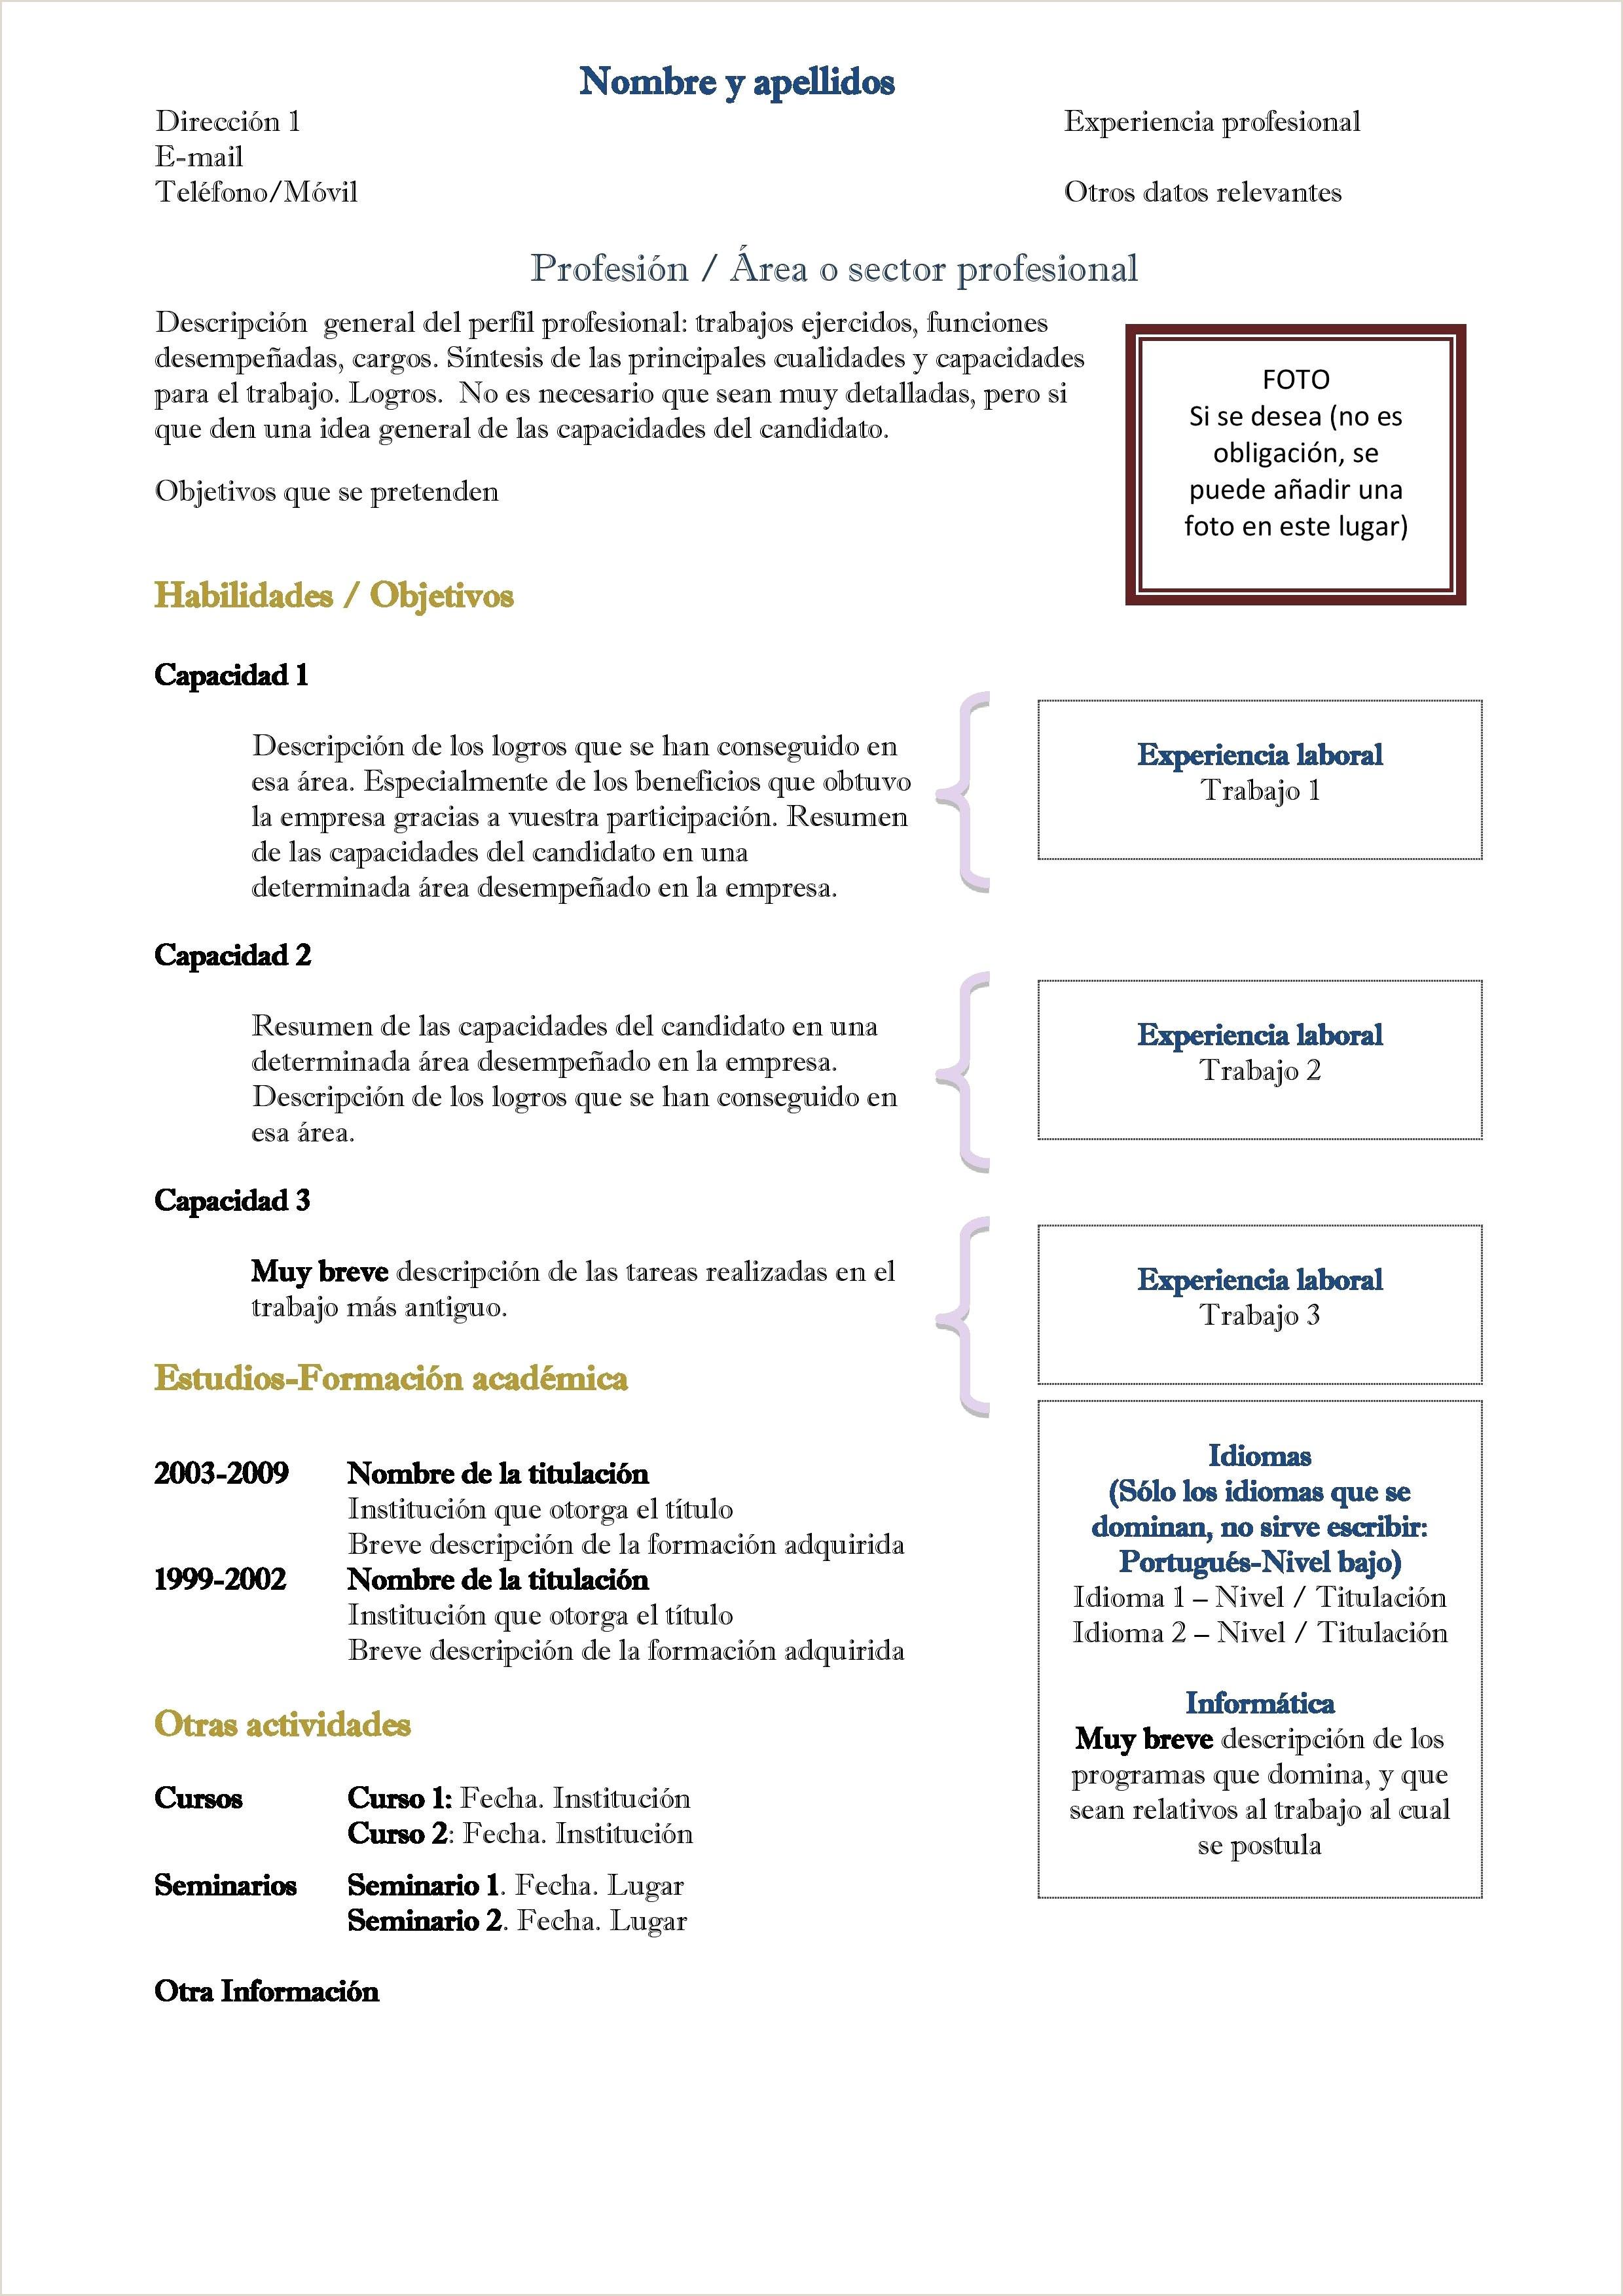 Curriculum Vitae Plantilla Word Para Rellenar Sencillo Curriculum Vitae Ingles Plantilla Word Para Rellenar